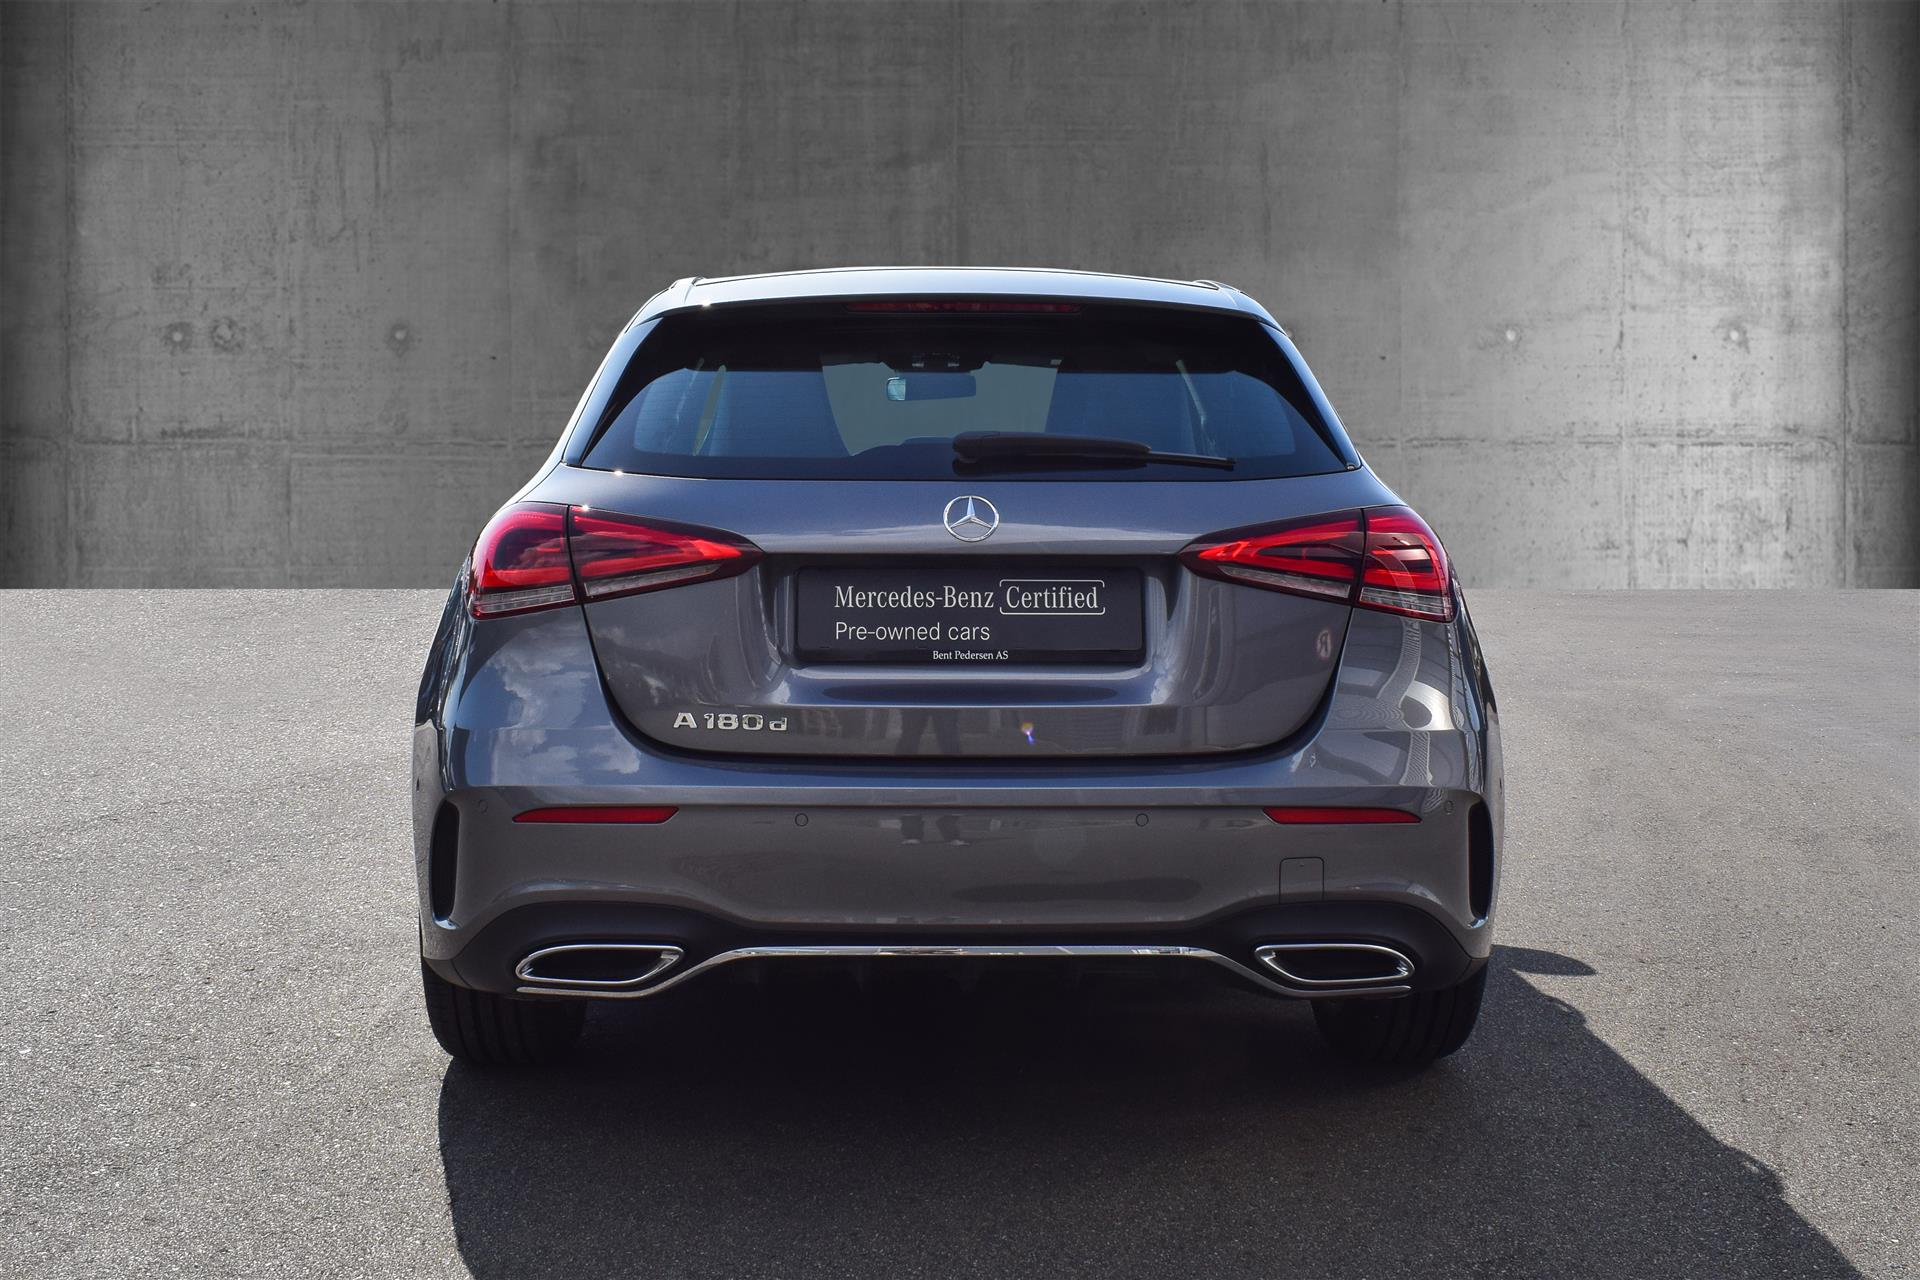 Billede af Mercedes-Benz A 180 1,5 CDI Advantage 7G-DCT 116HK 5d 7g Aut.